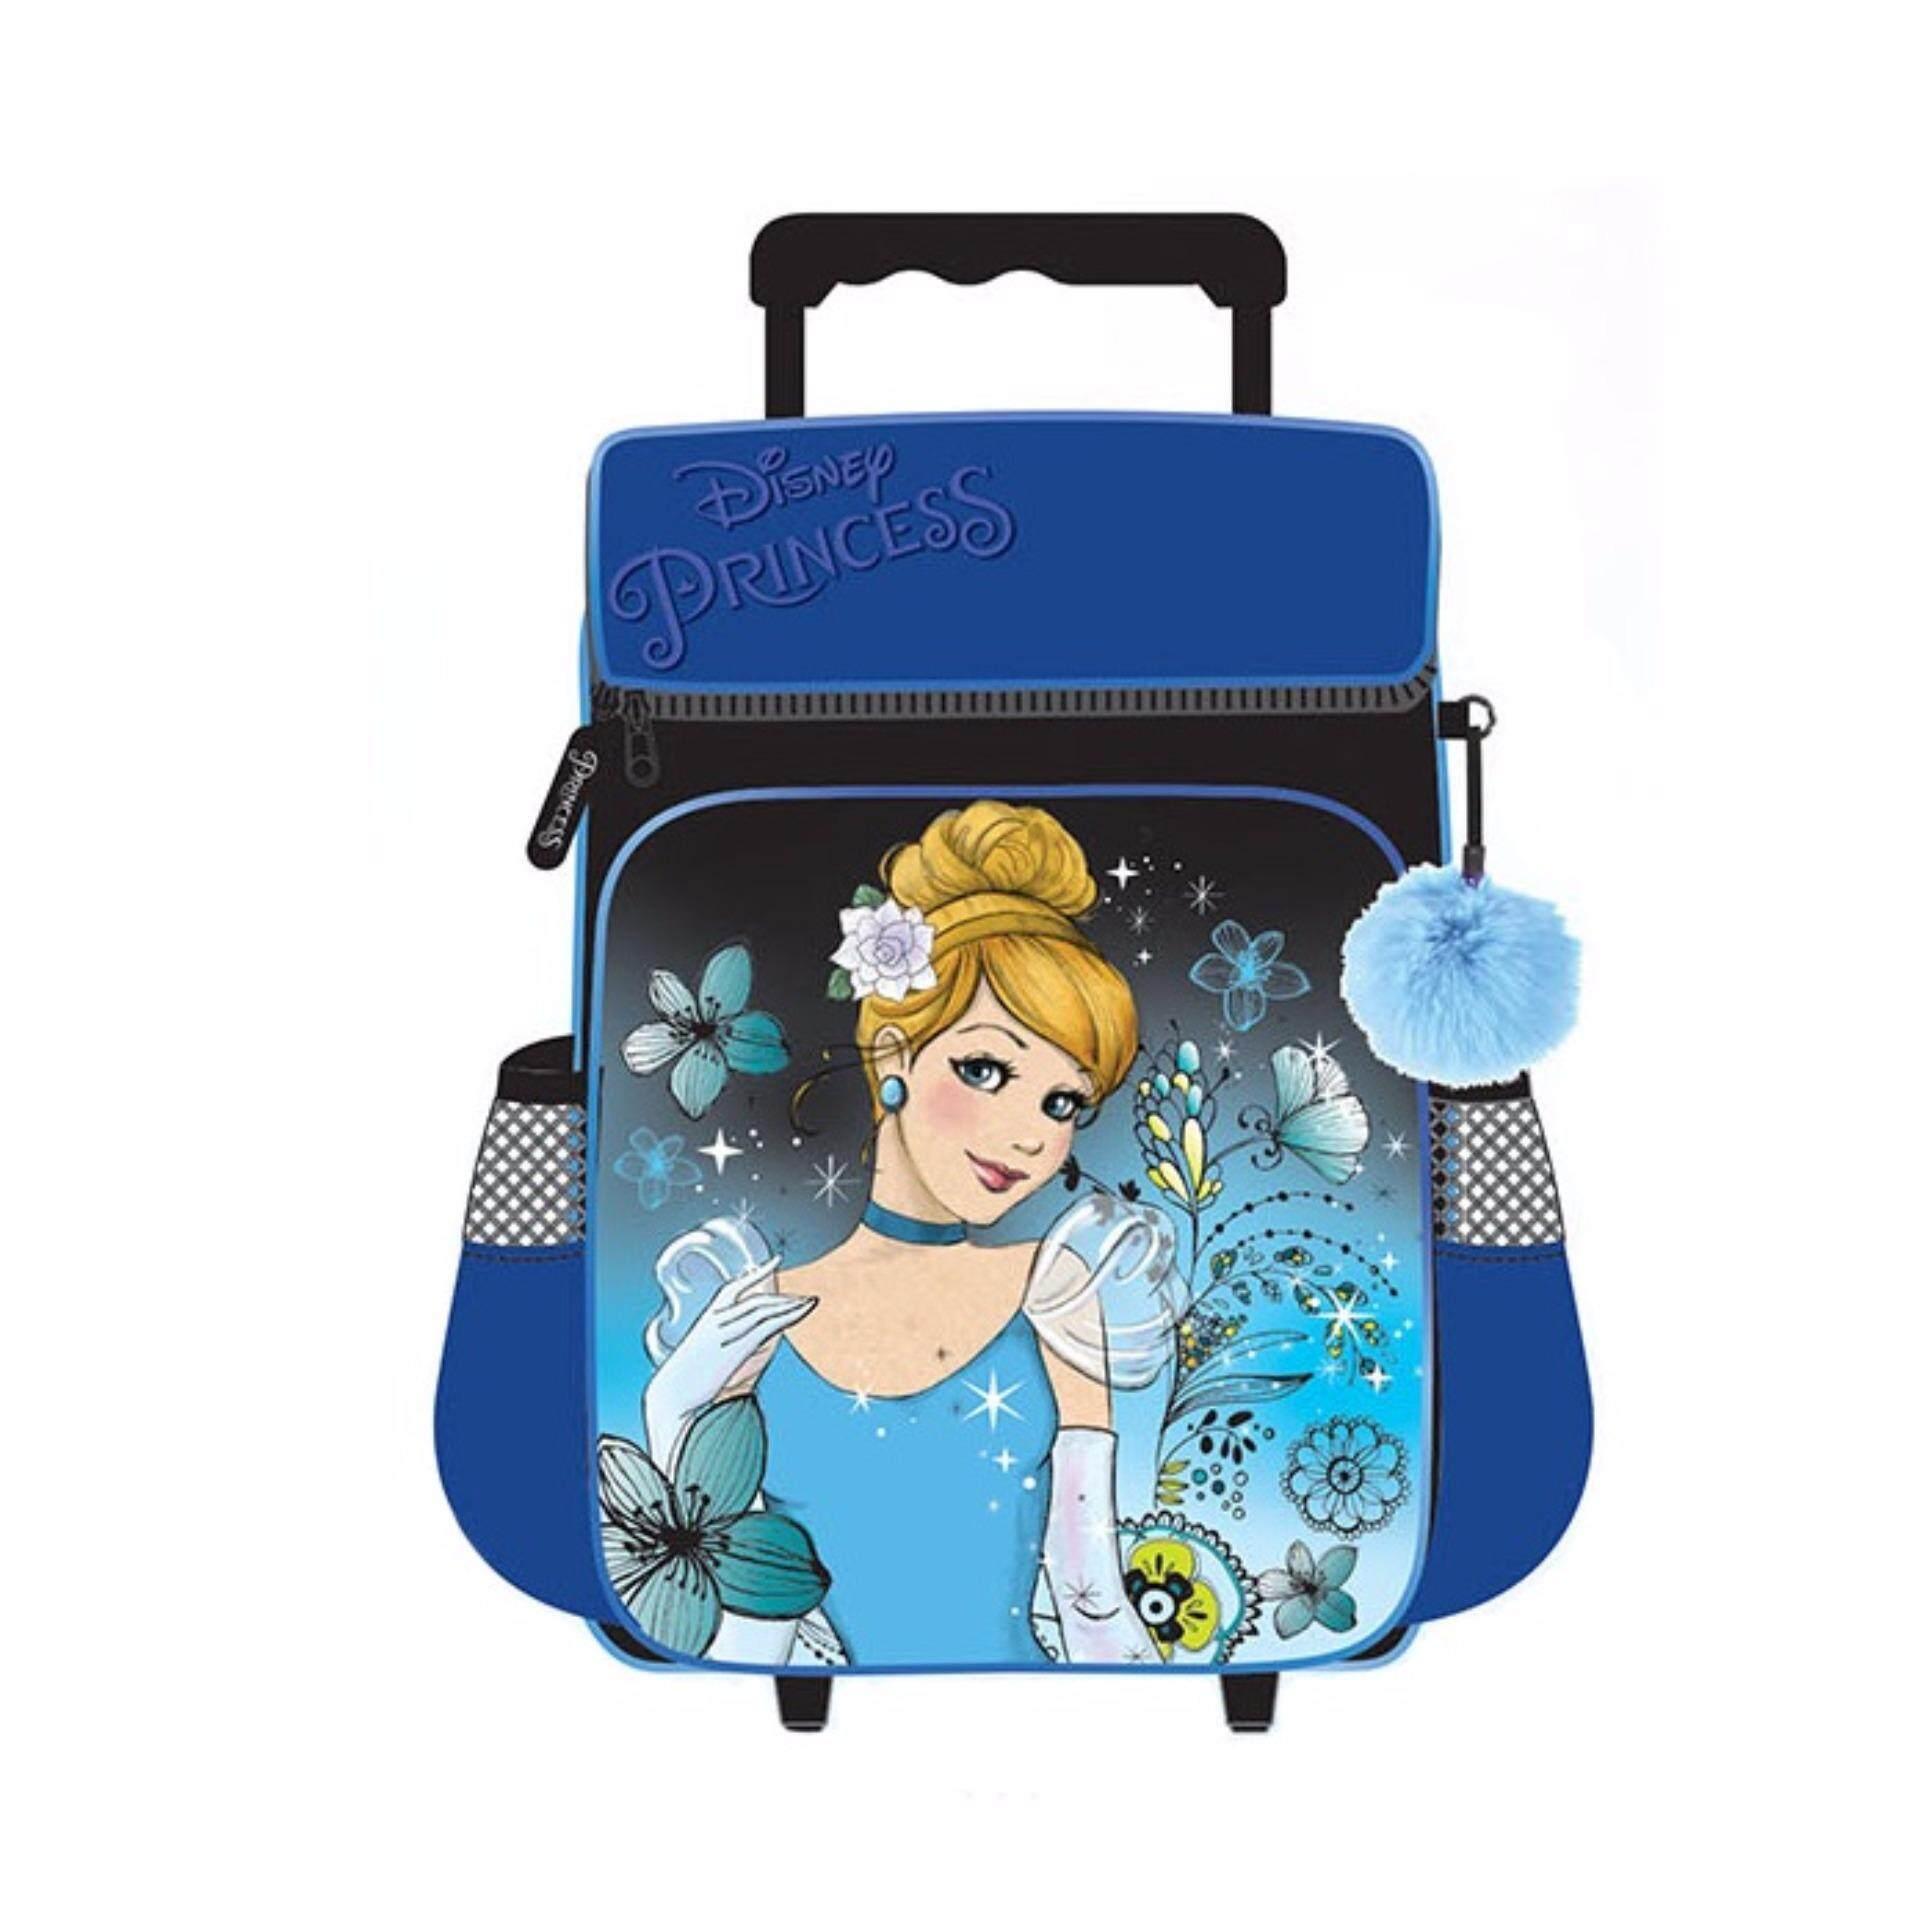 Disney Princess Cinderella School Trolley Bag - Blue Colour